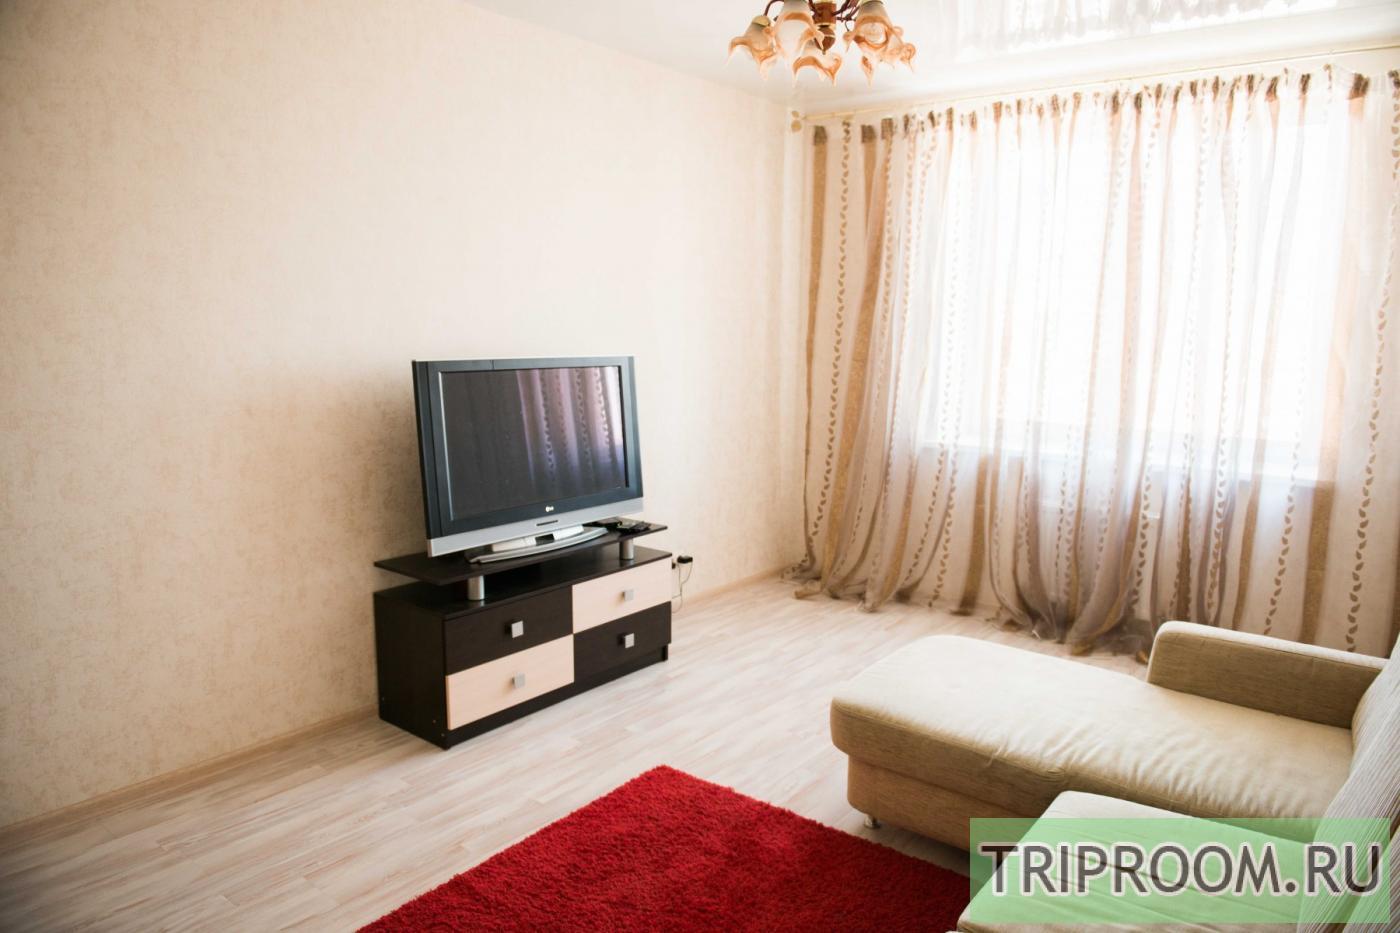 1-комнатная квартира посуточно (вариант № 32598), ул. Гарабурды улица, фото № 1